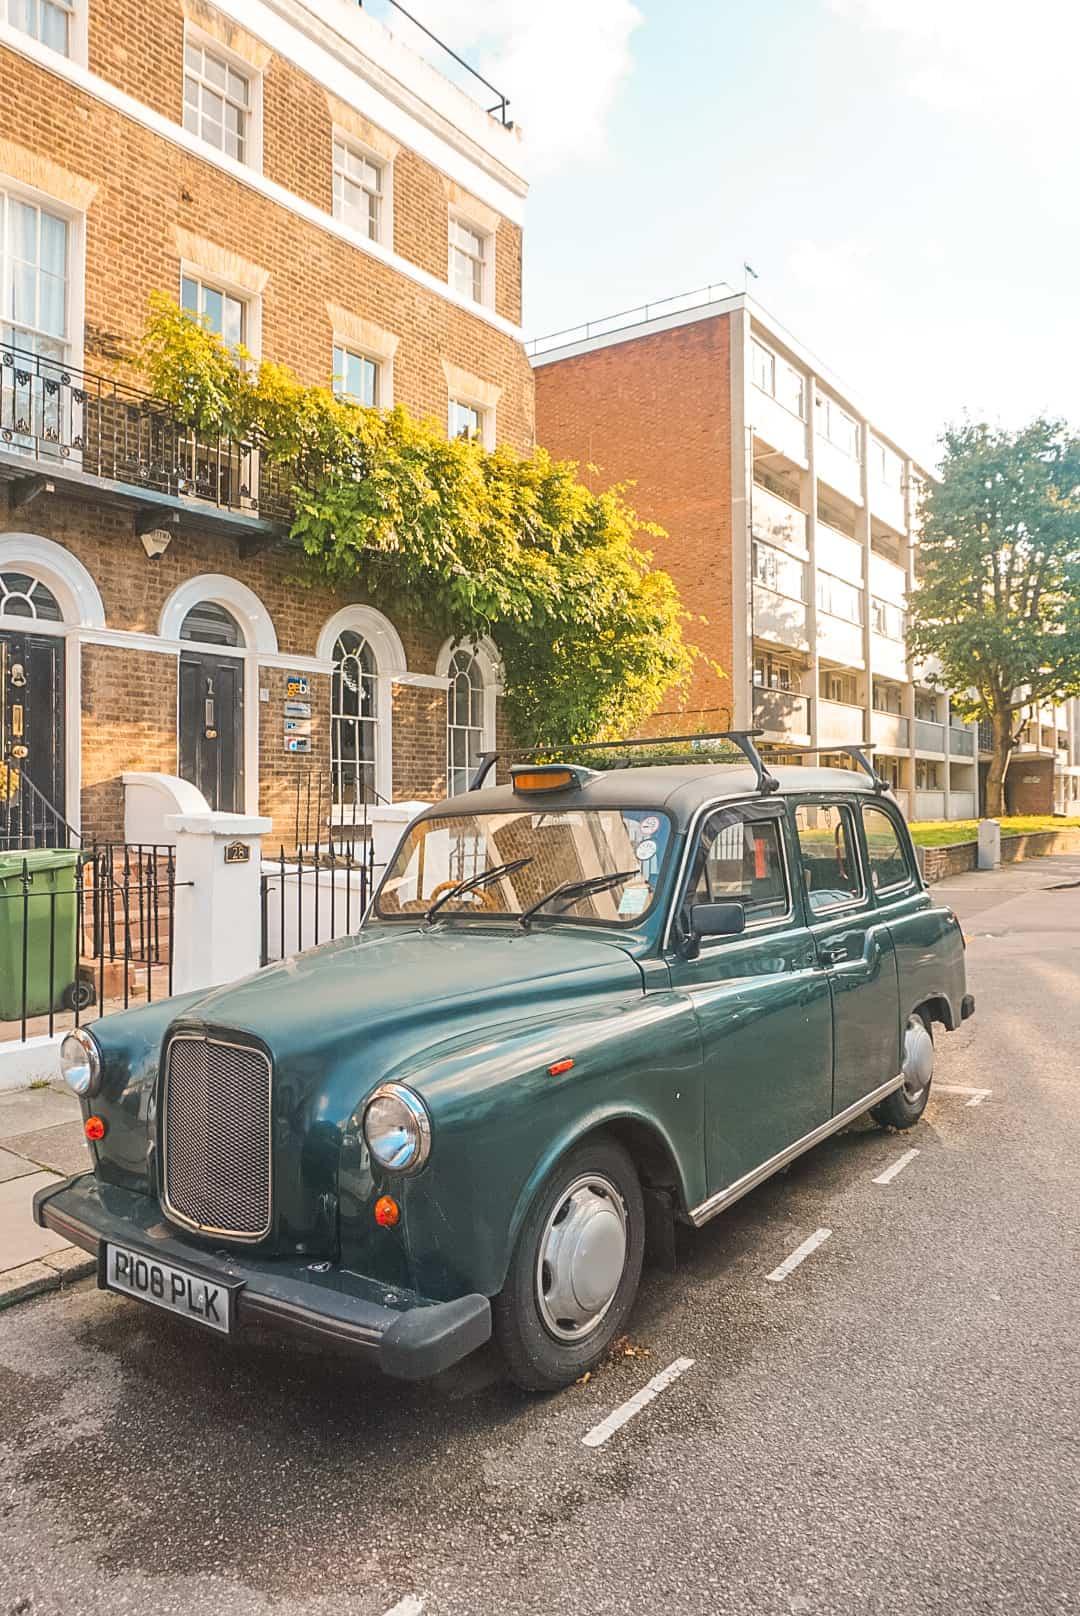 Car in Greenwich